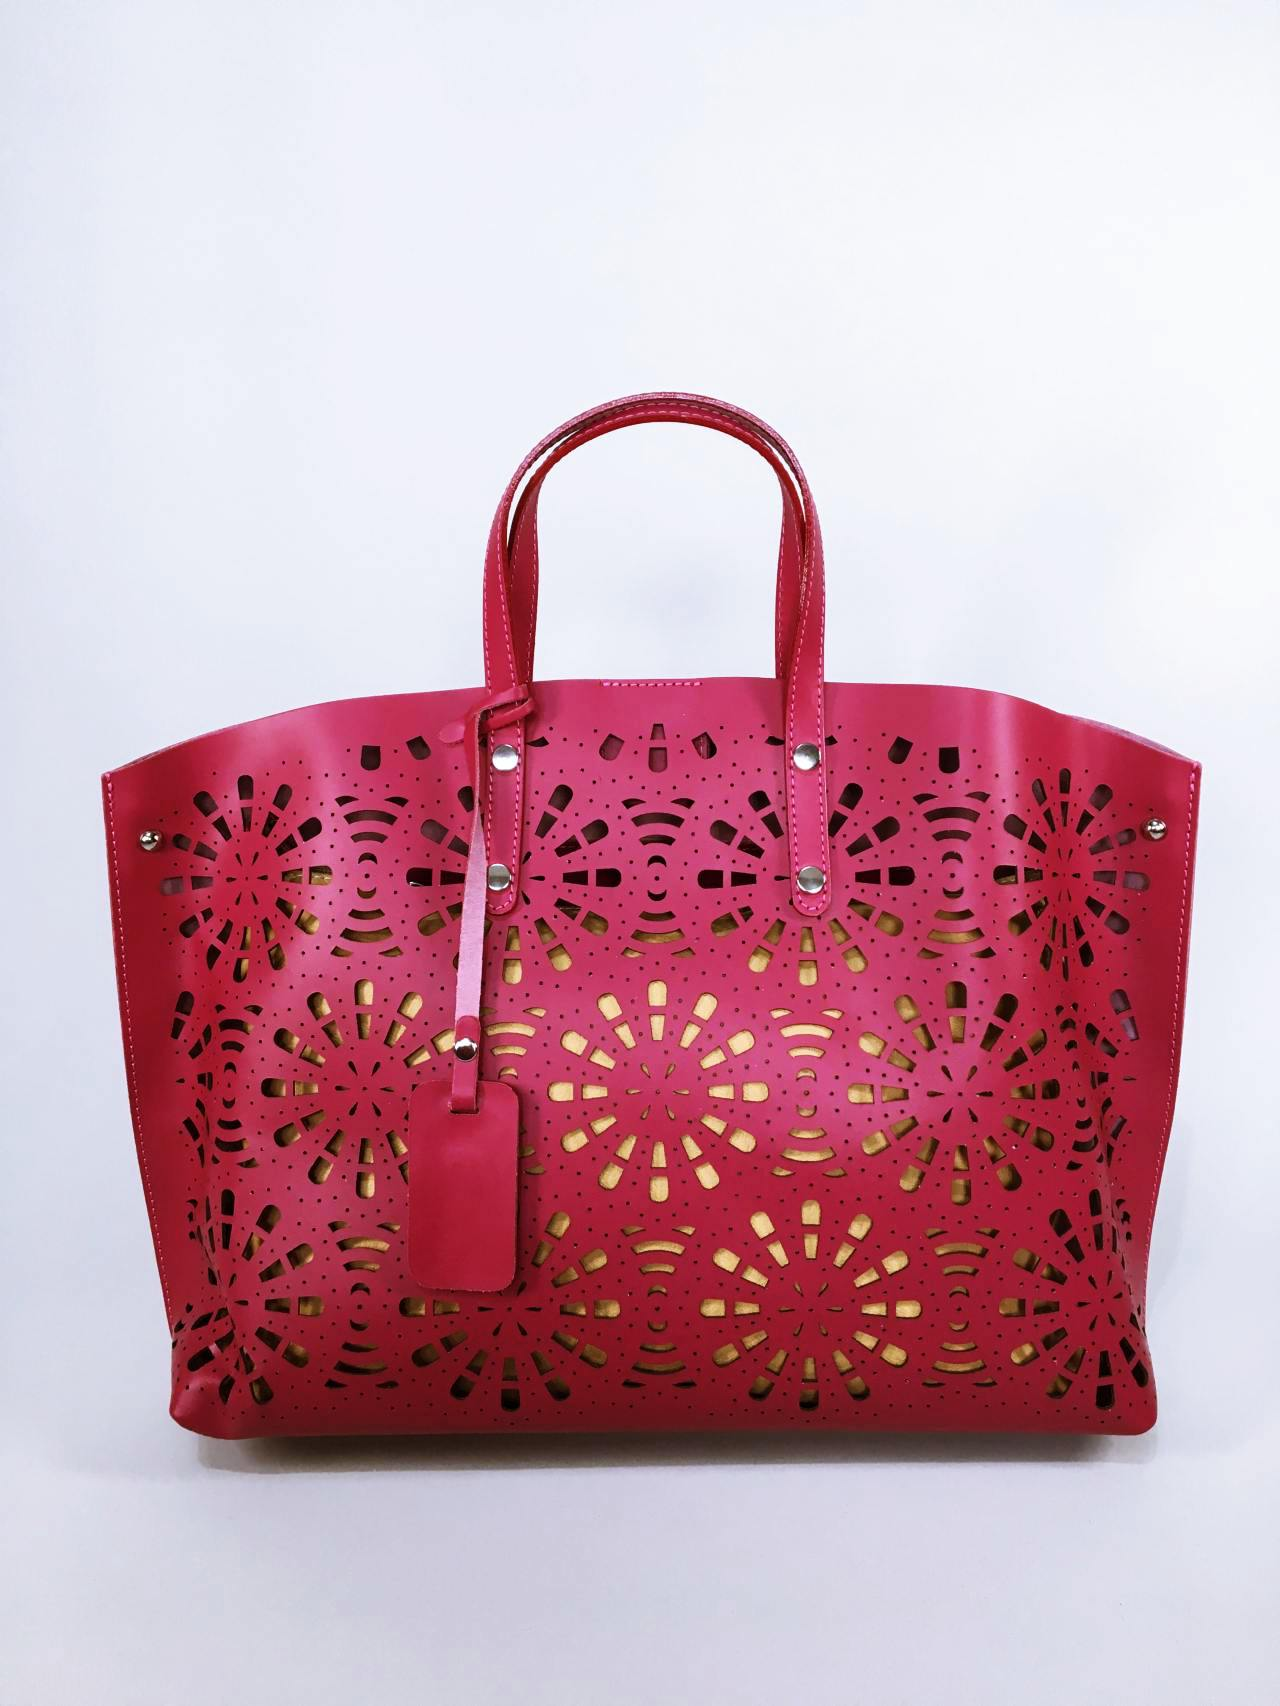 Kožená kabelka Gigi bordó – Simm-Fashion.cz 020ec1d57b